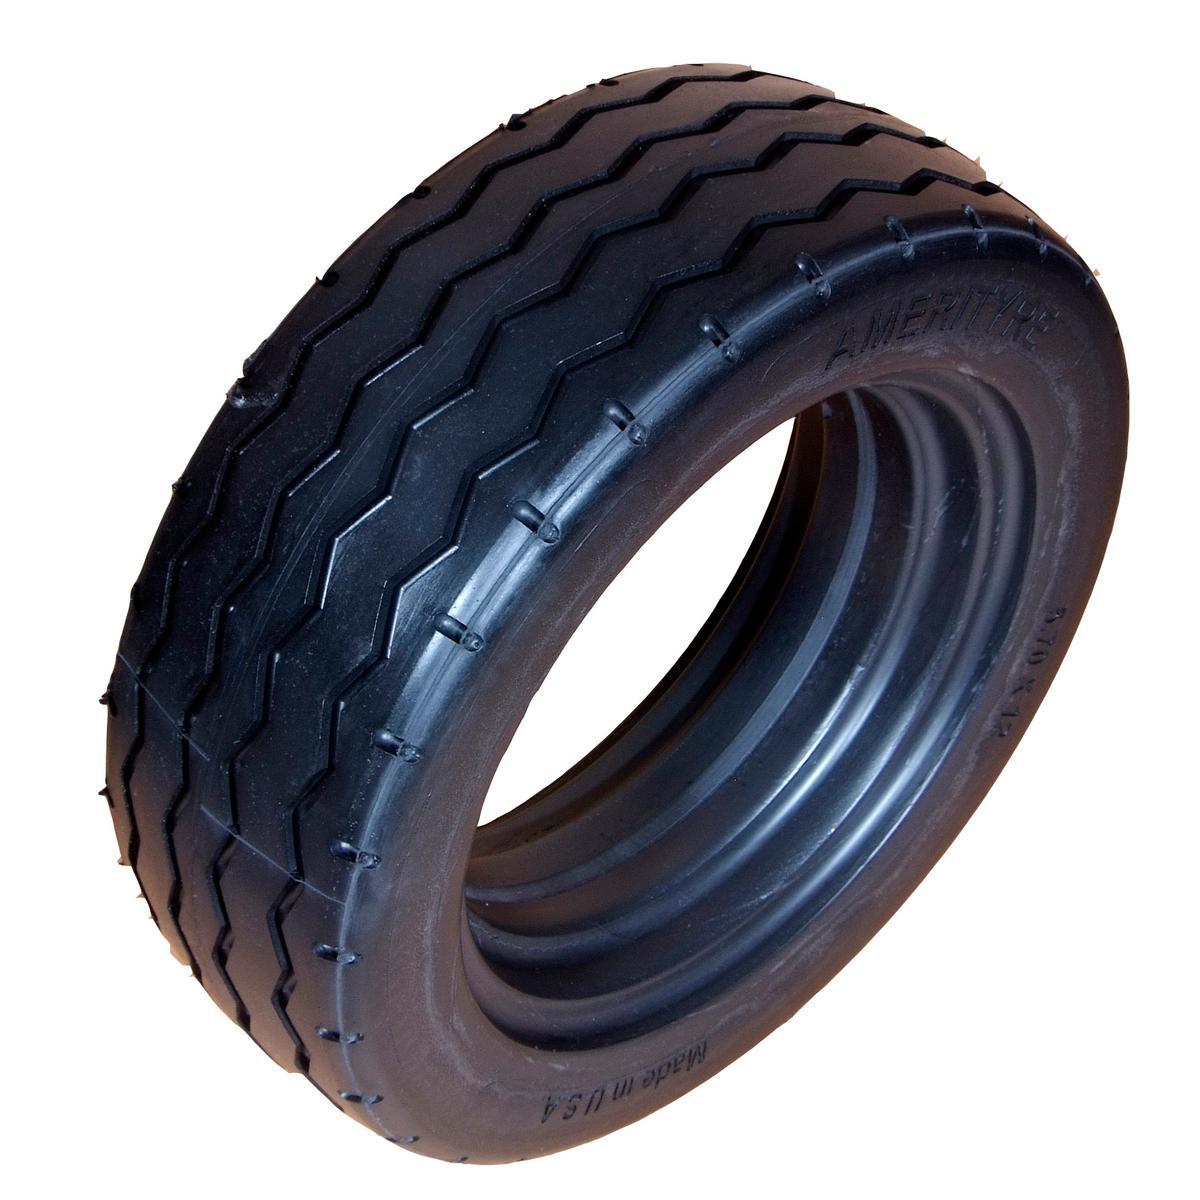 Amerityre Sawtooth 4.80-12 Flat Free Golf Cart Tire